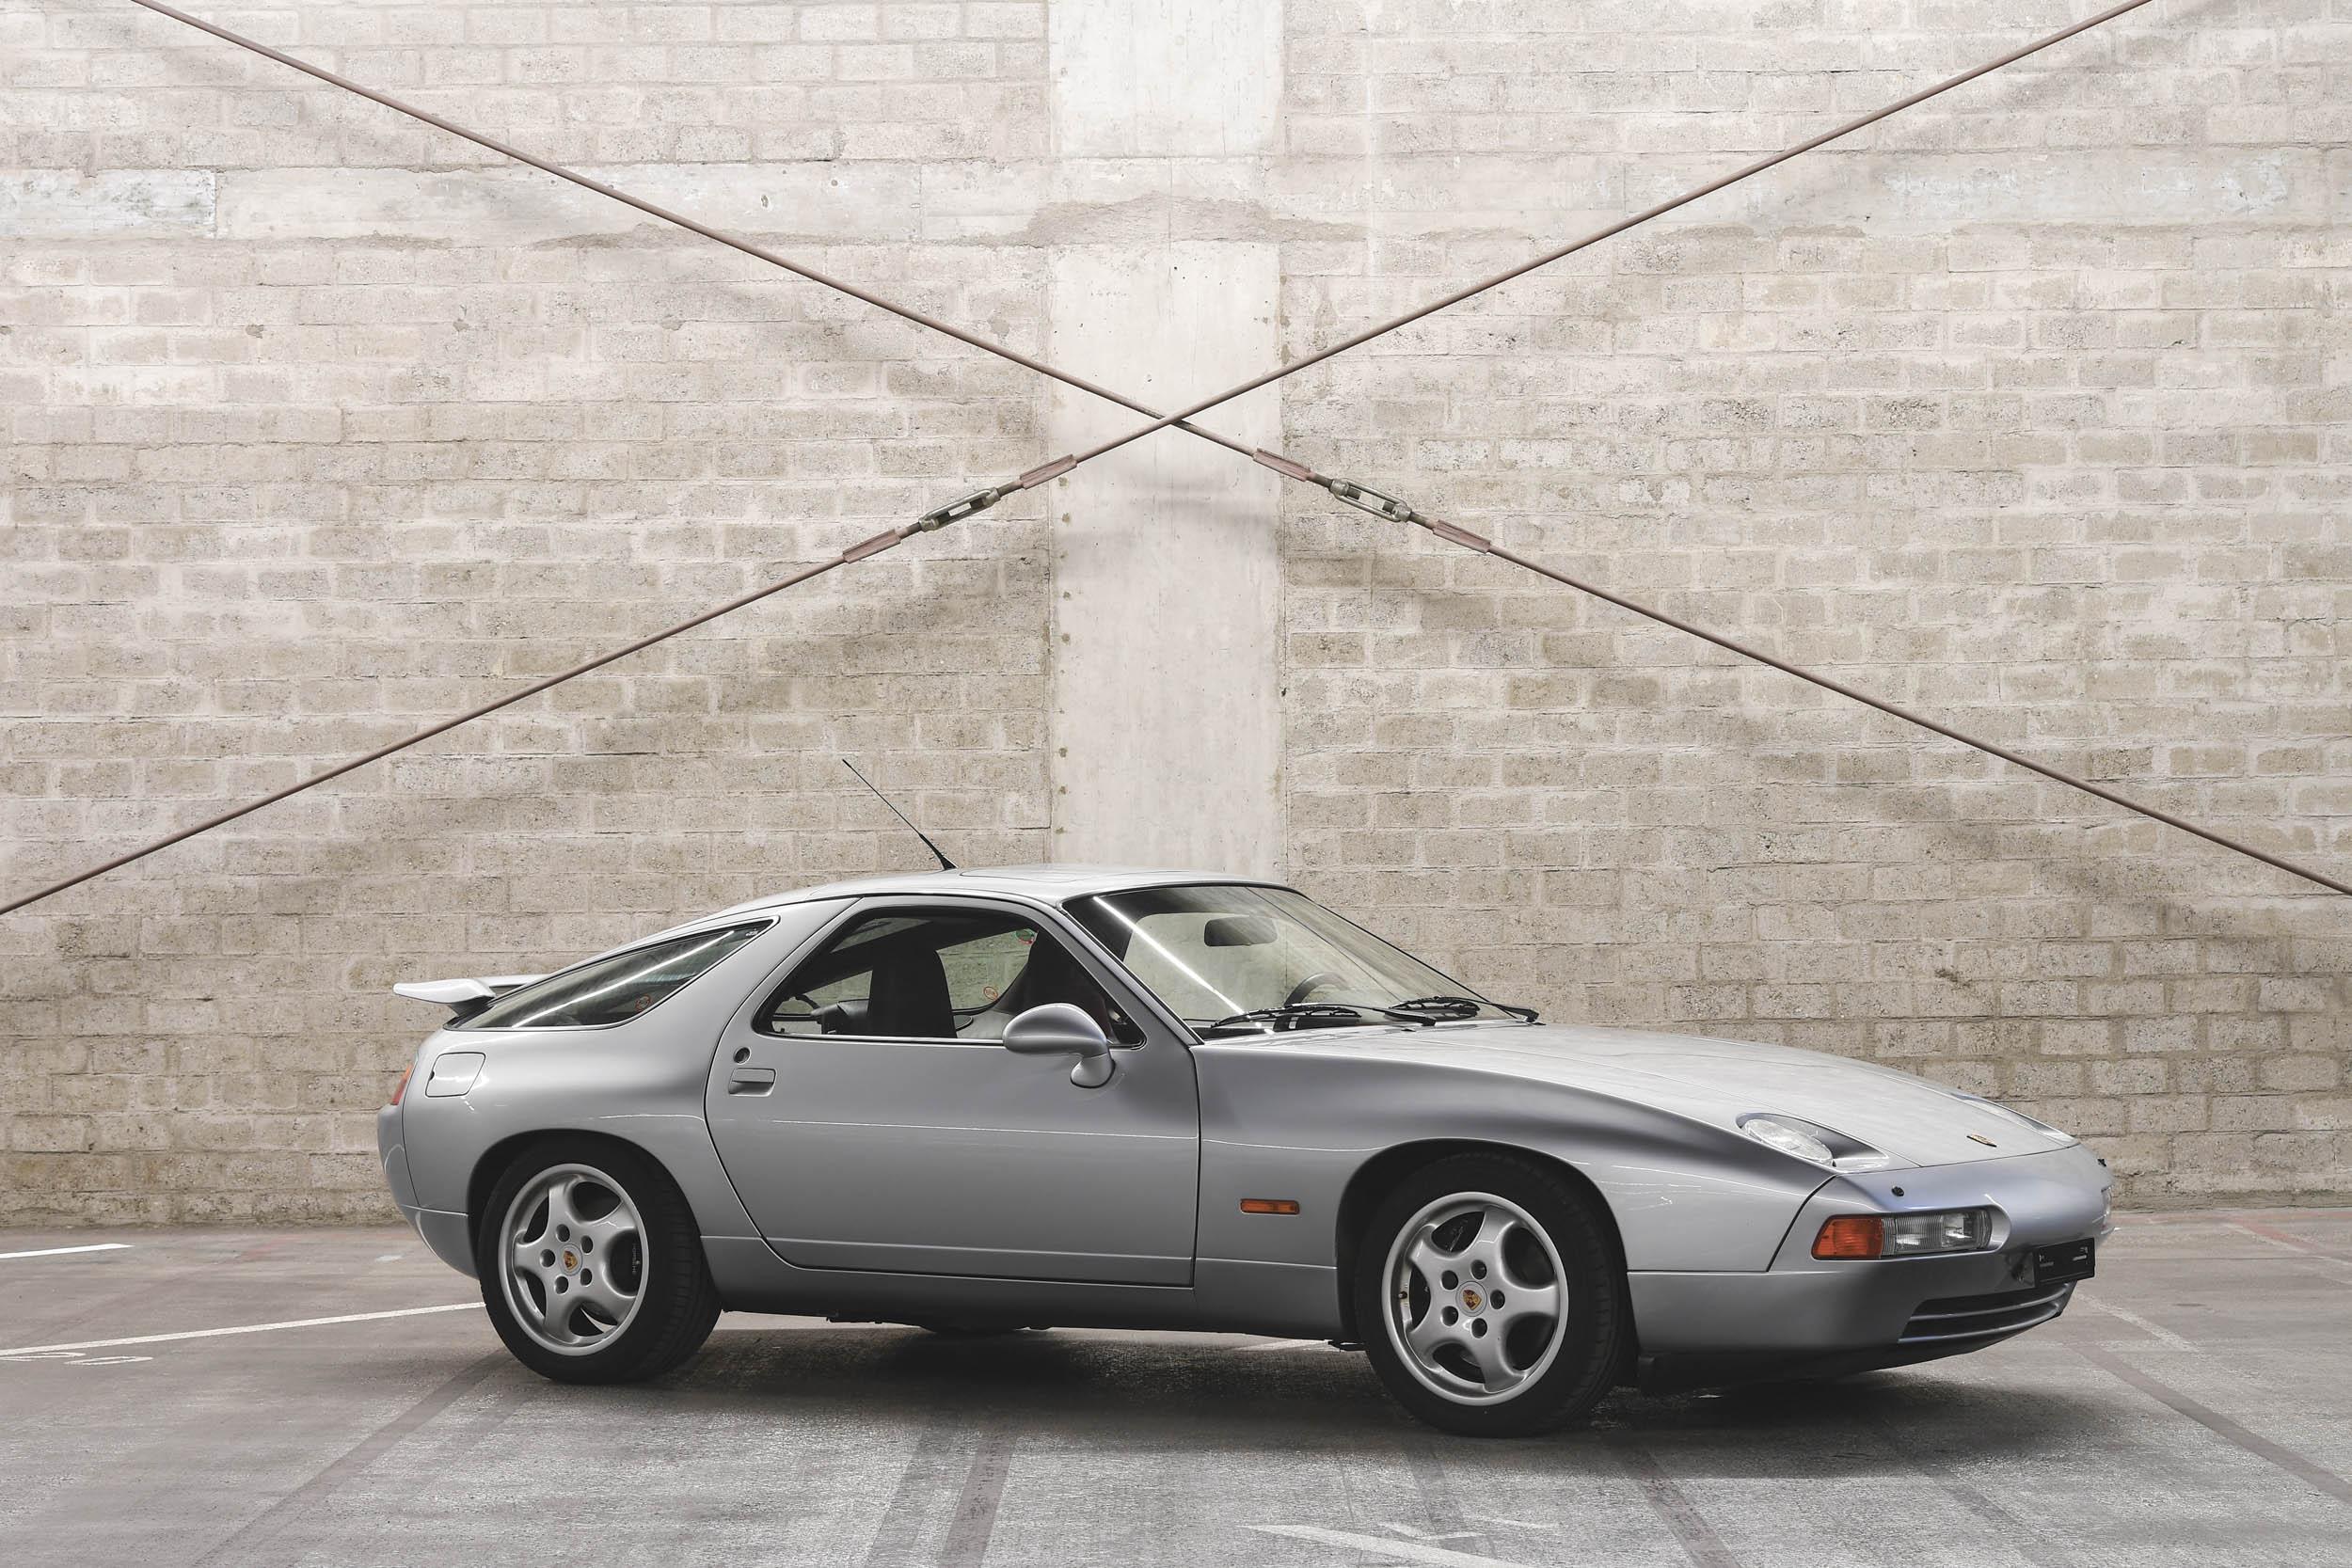 1992 Porsche 928 GTS